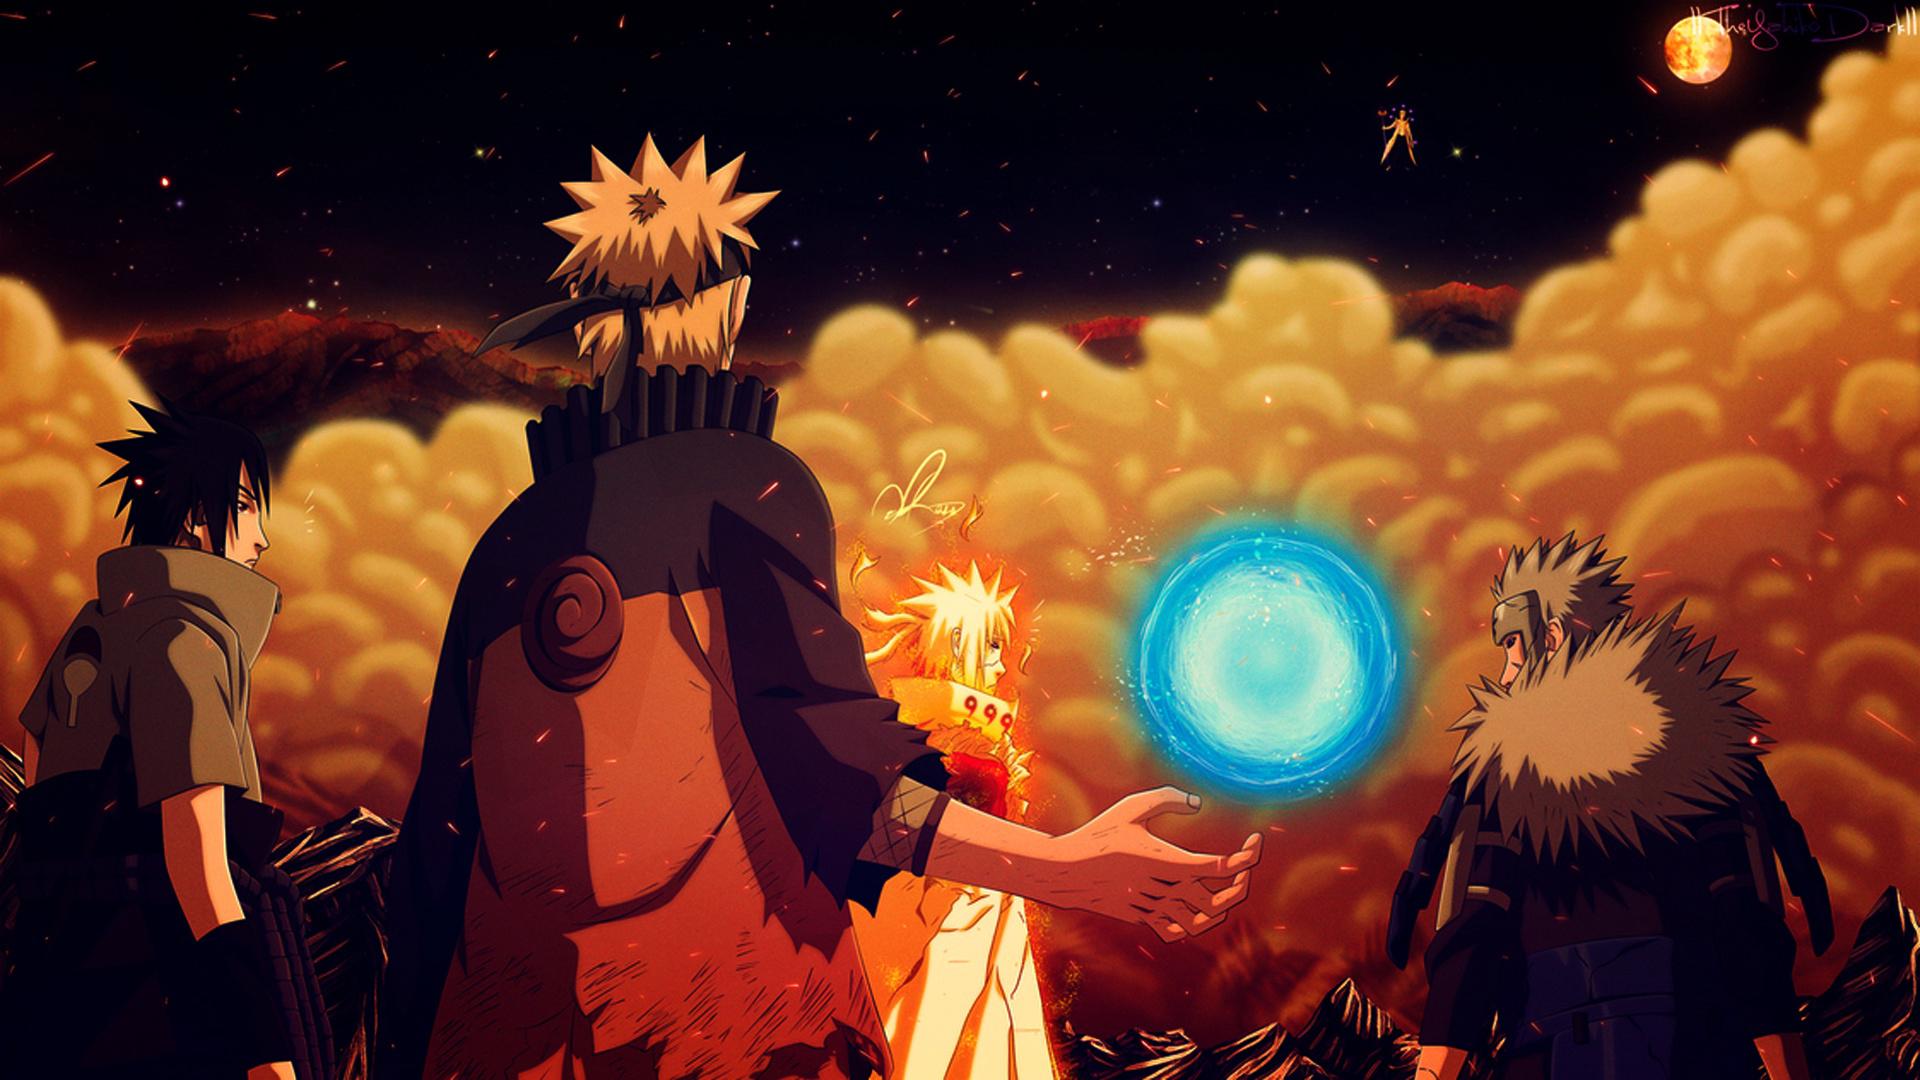 And Madara Naruto Minato Sasuke Tobirama Vs Obito